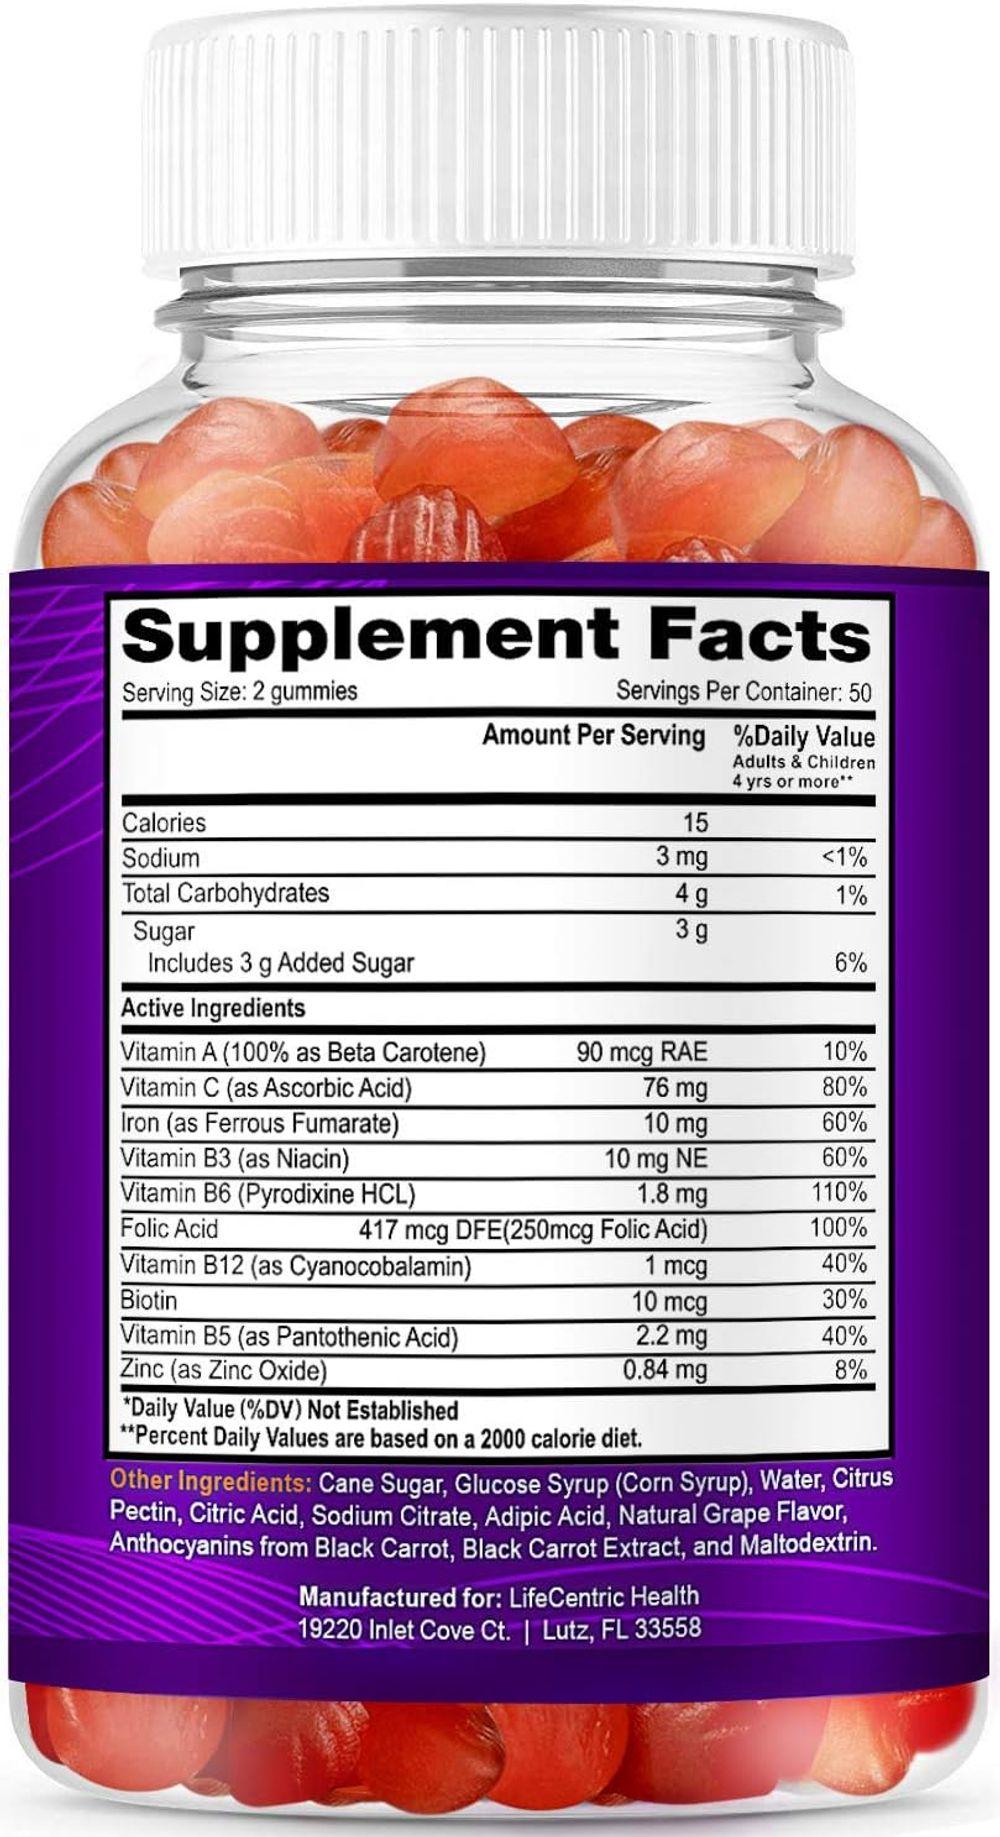 Iron Gummies for Adults and Kids   Biotin Zinc Vitamin B Folic Acid Vitamin Gummies   Vegan Gluten Free Blood Builder Anemia Supplements   Tasty Energy Boosting Iron Supplement for Women and Men